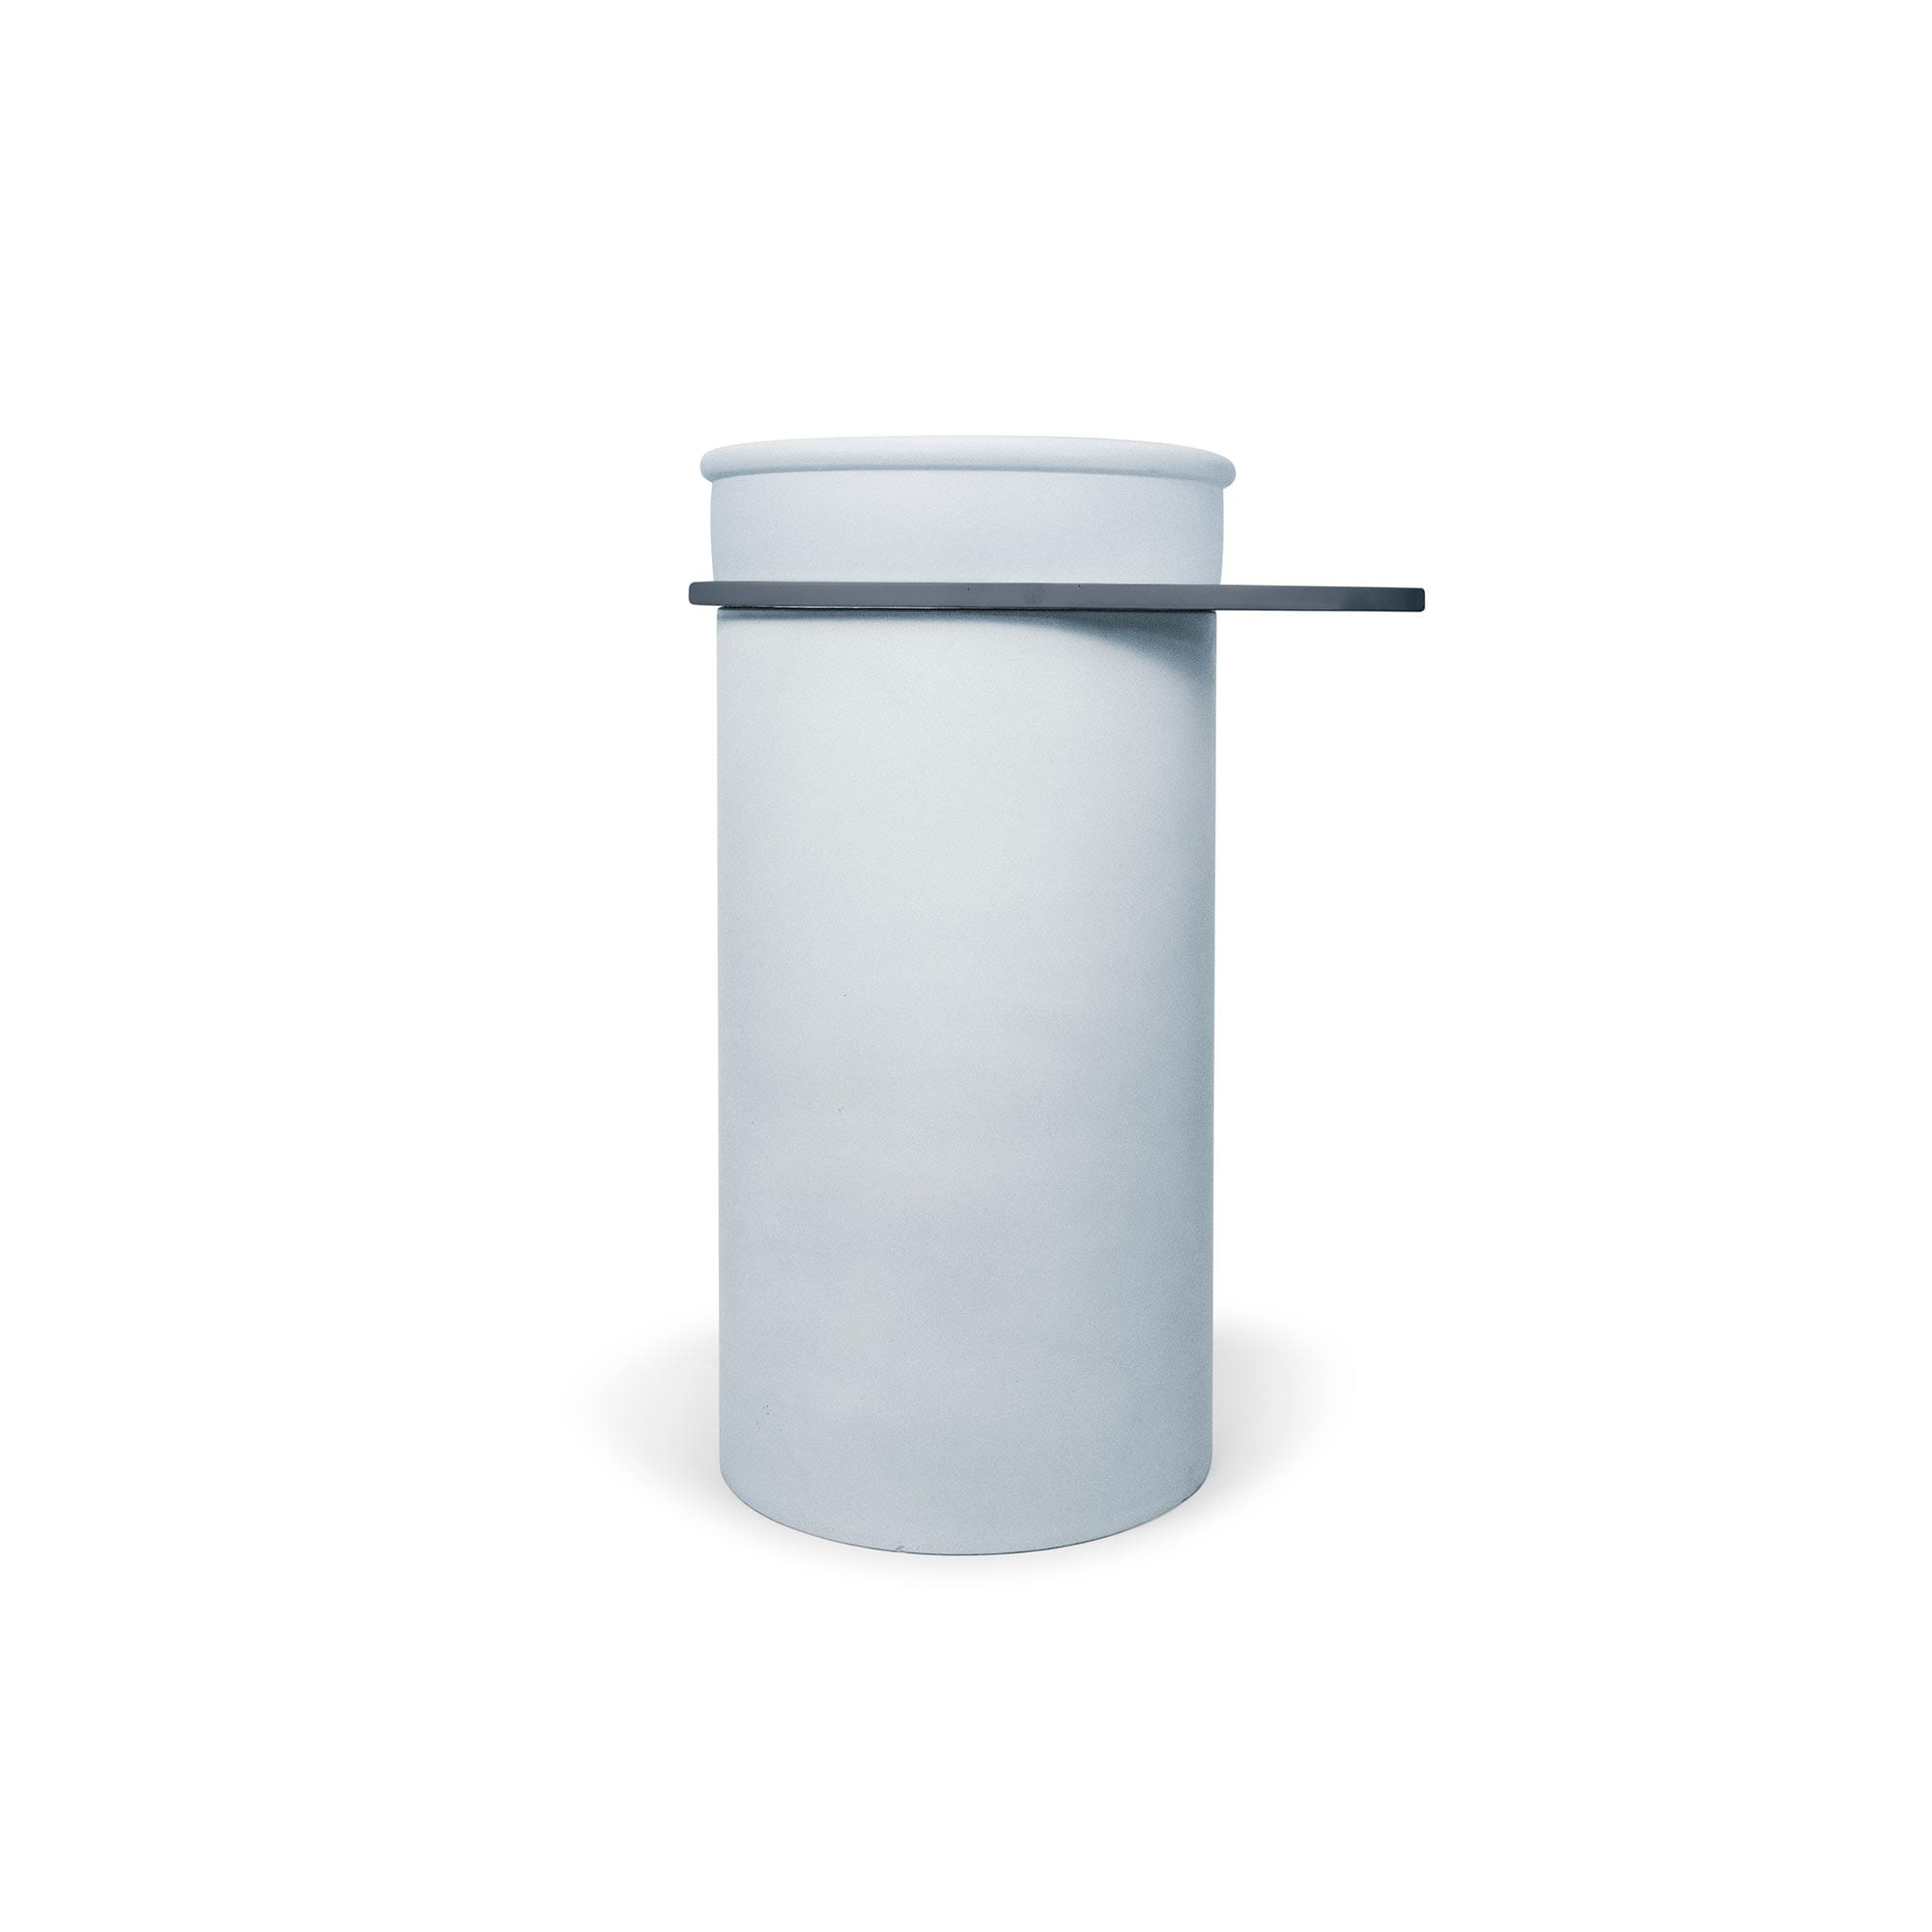 Tubb Basin Cylinder 5